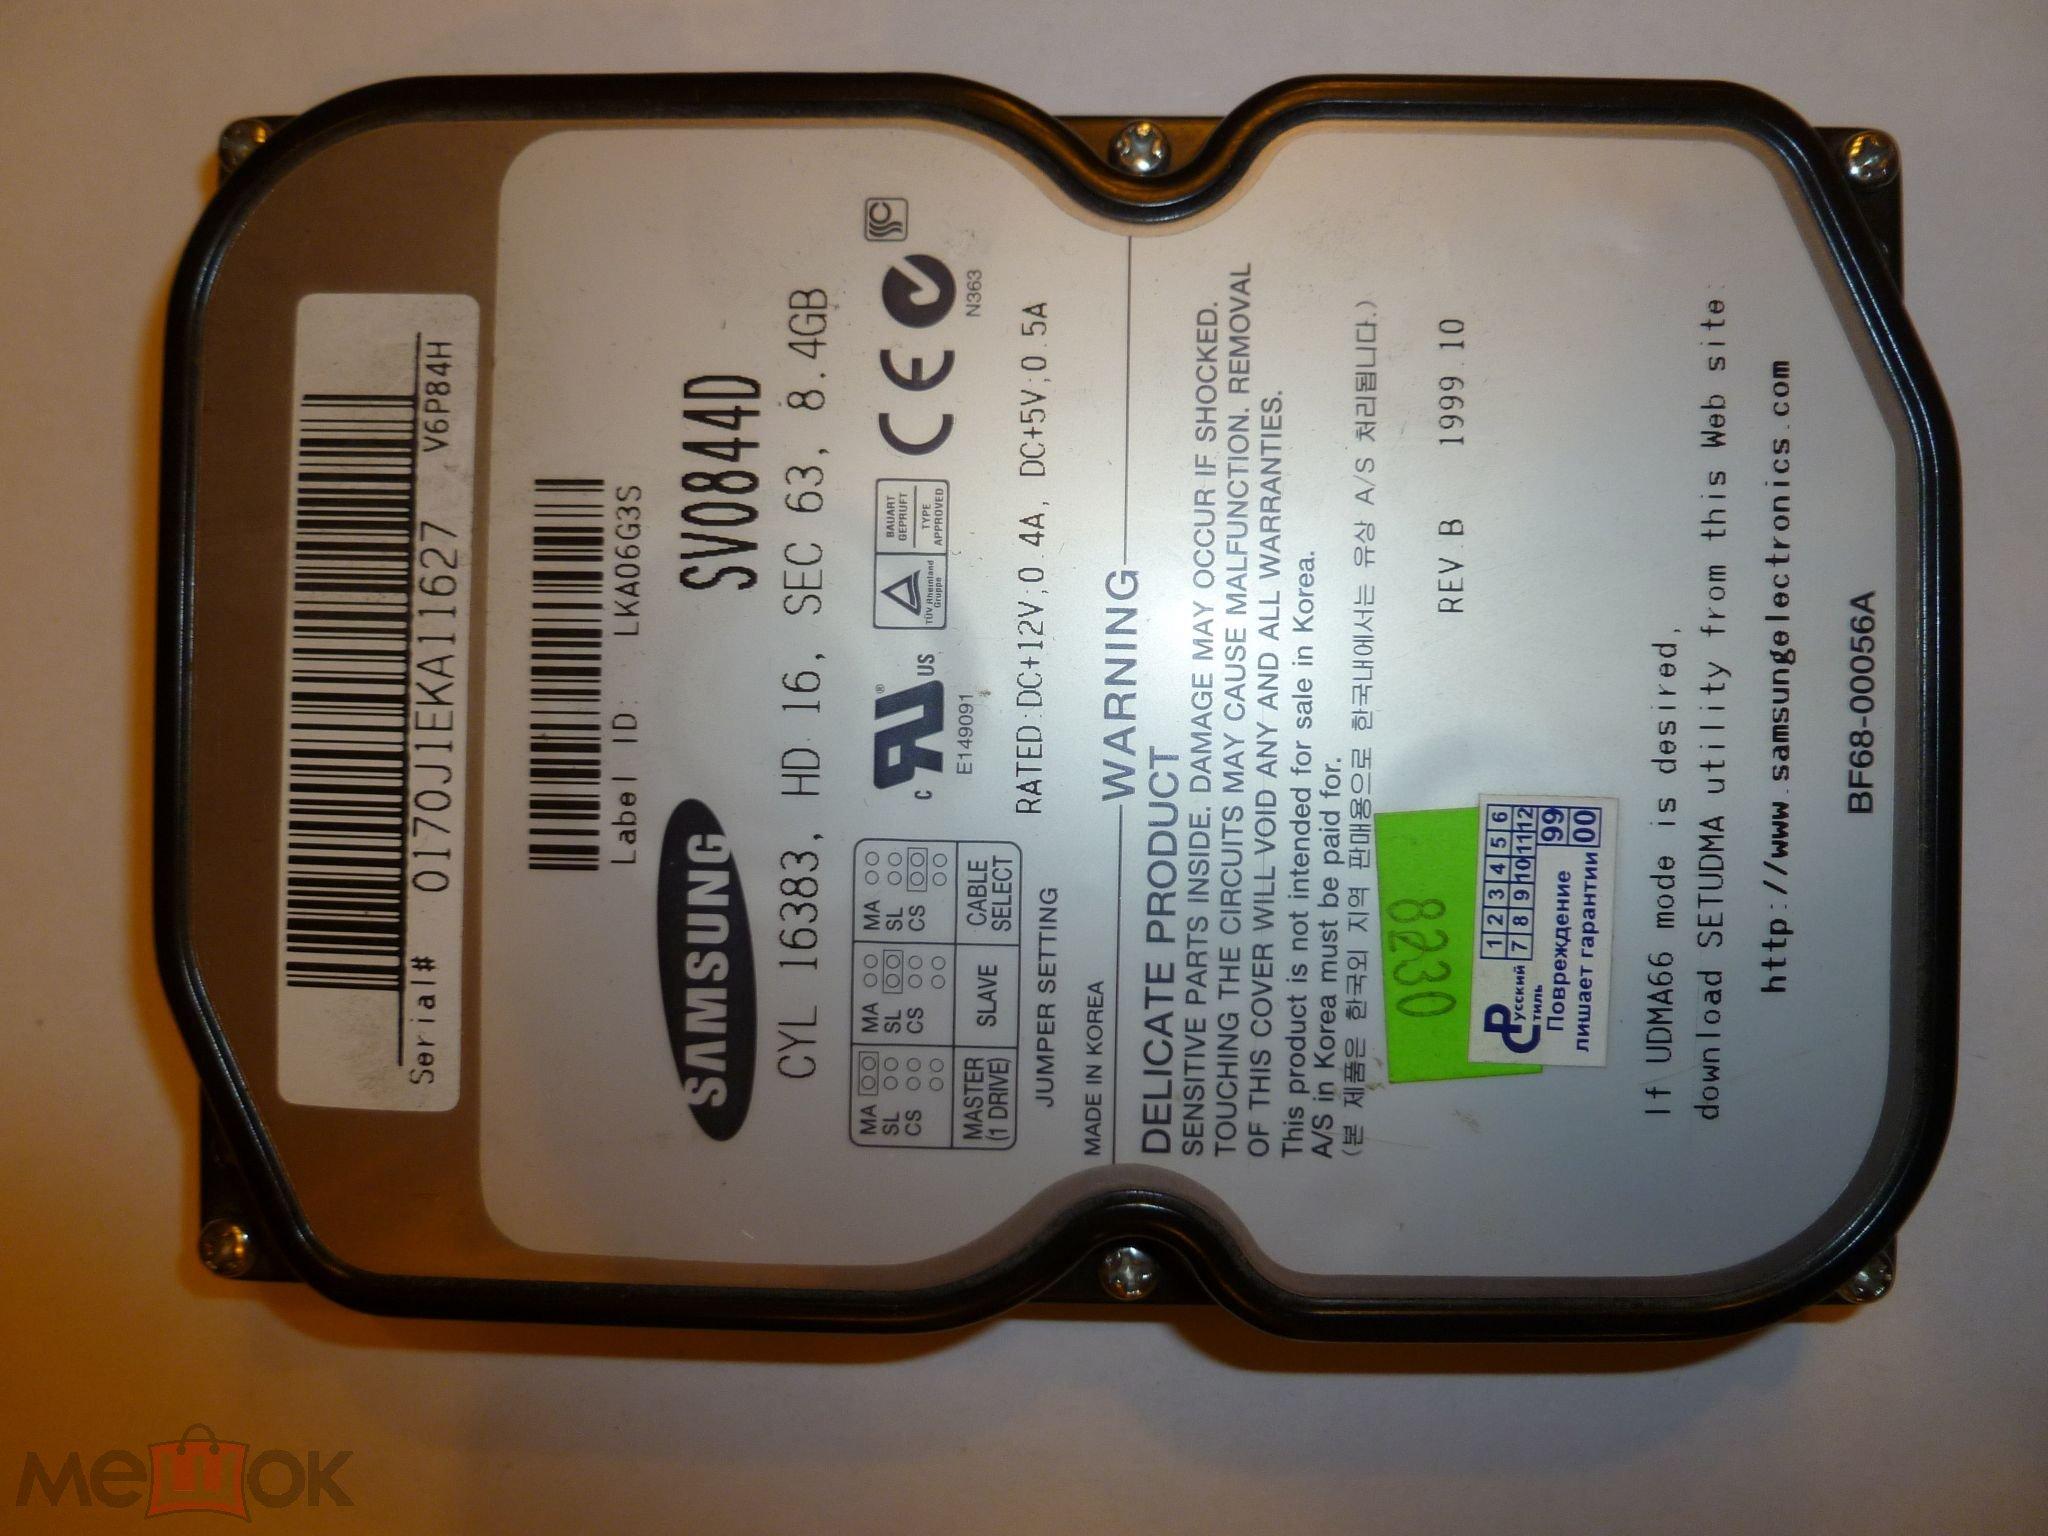 Жесткий диск SV0844D-Samsung 8.4 GB IDE HDD